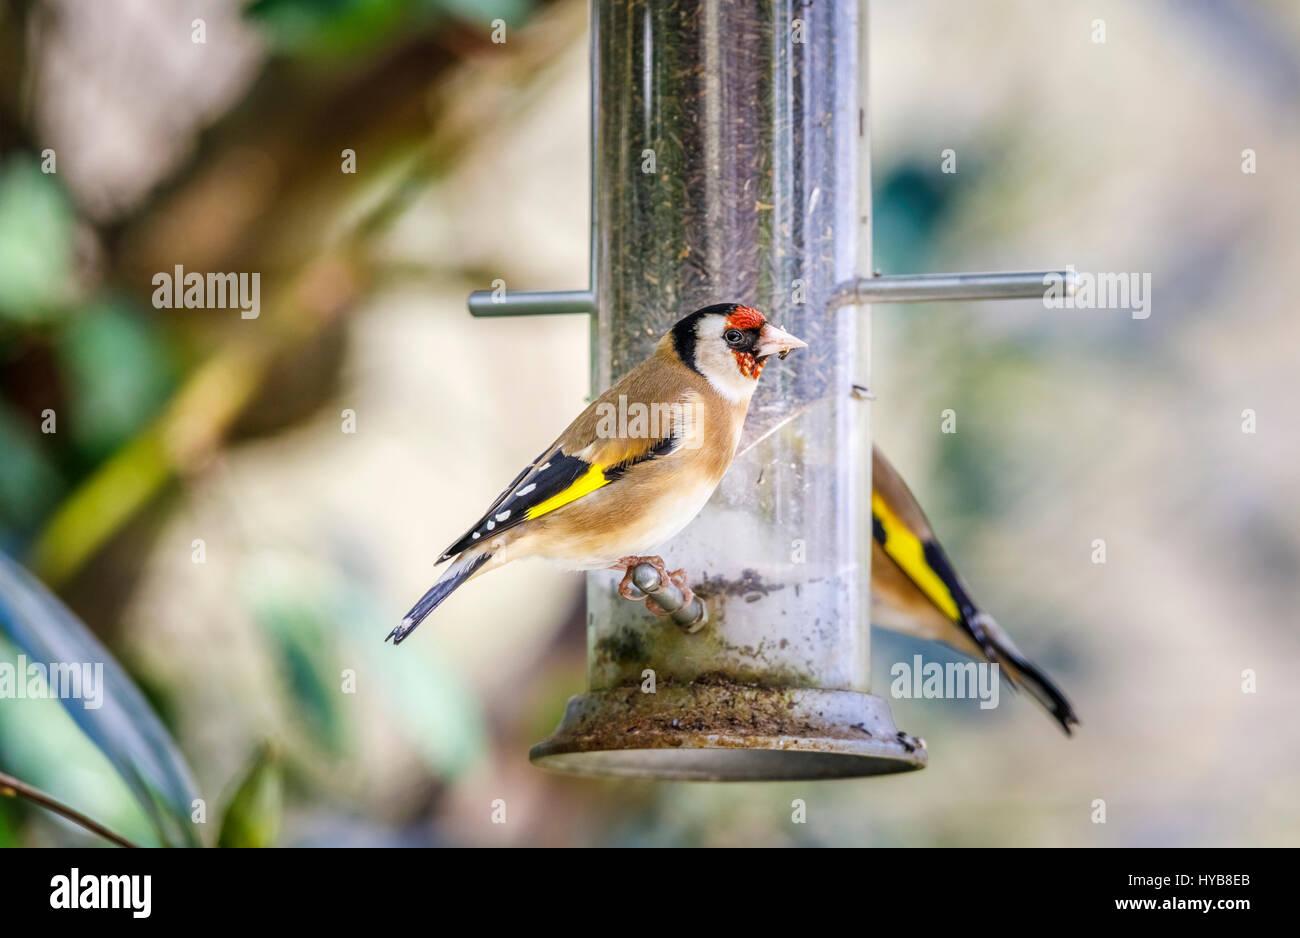 Colourful Carduelis carduelis, European goldfinch, perching, feeding at a niger seed bird feeder in an English garden Stock Photo